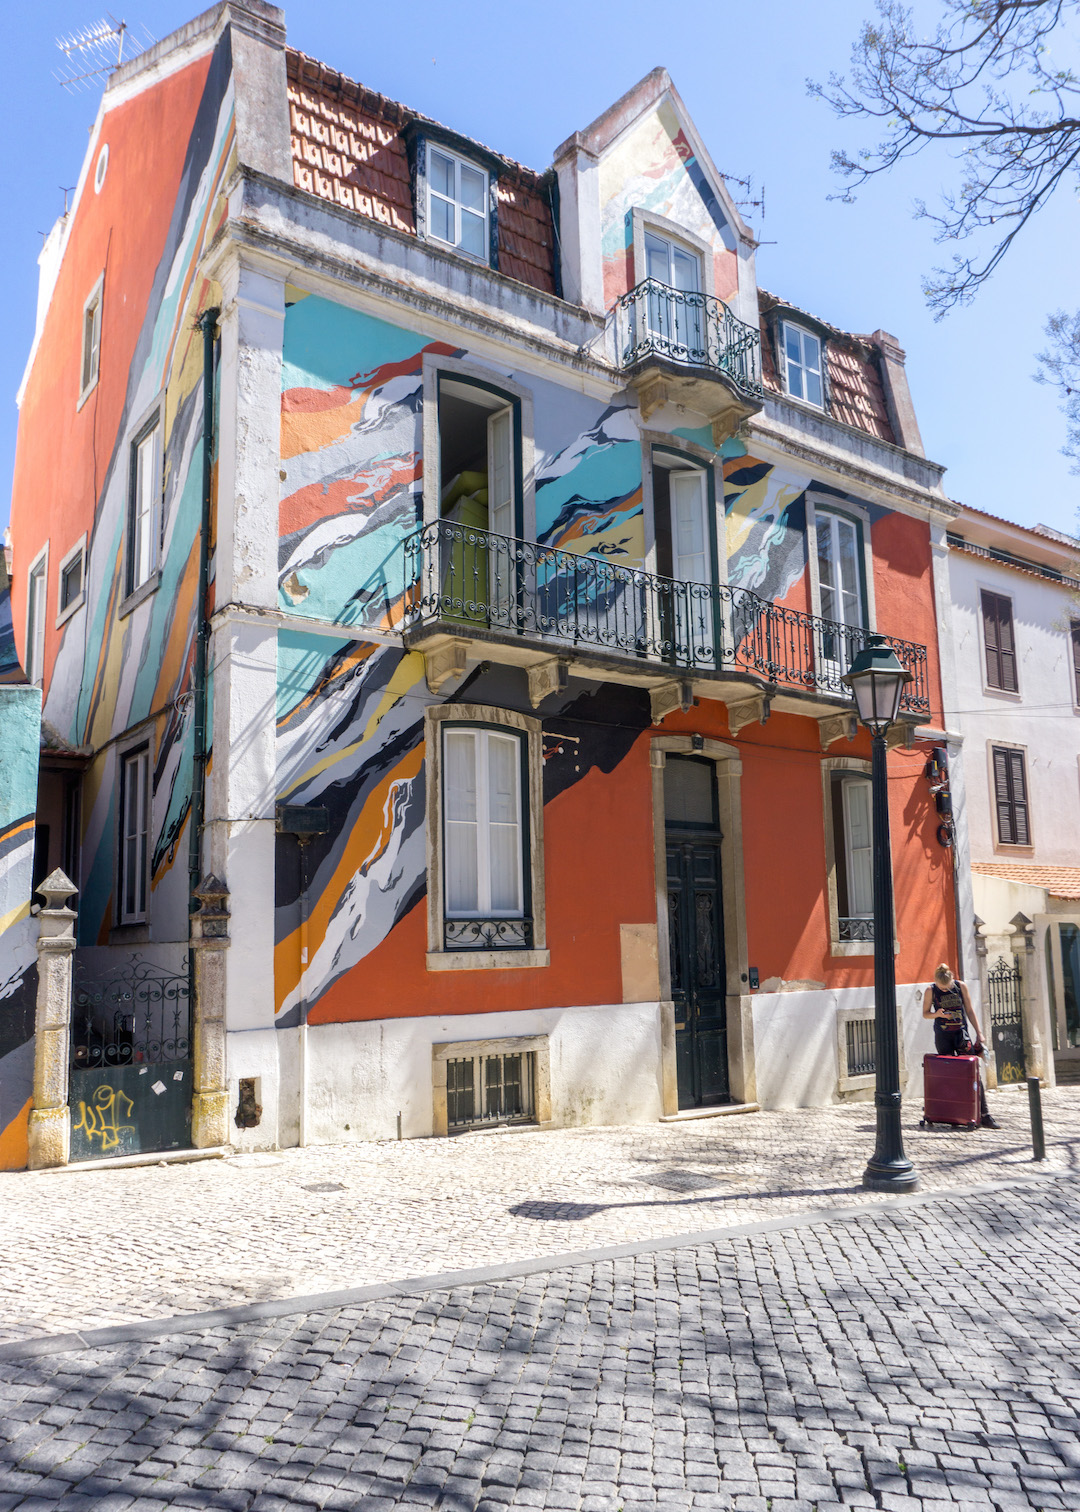 Her_Travel_Edit_Cascais_Building_Art